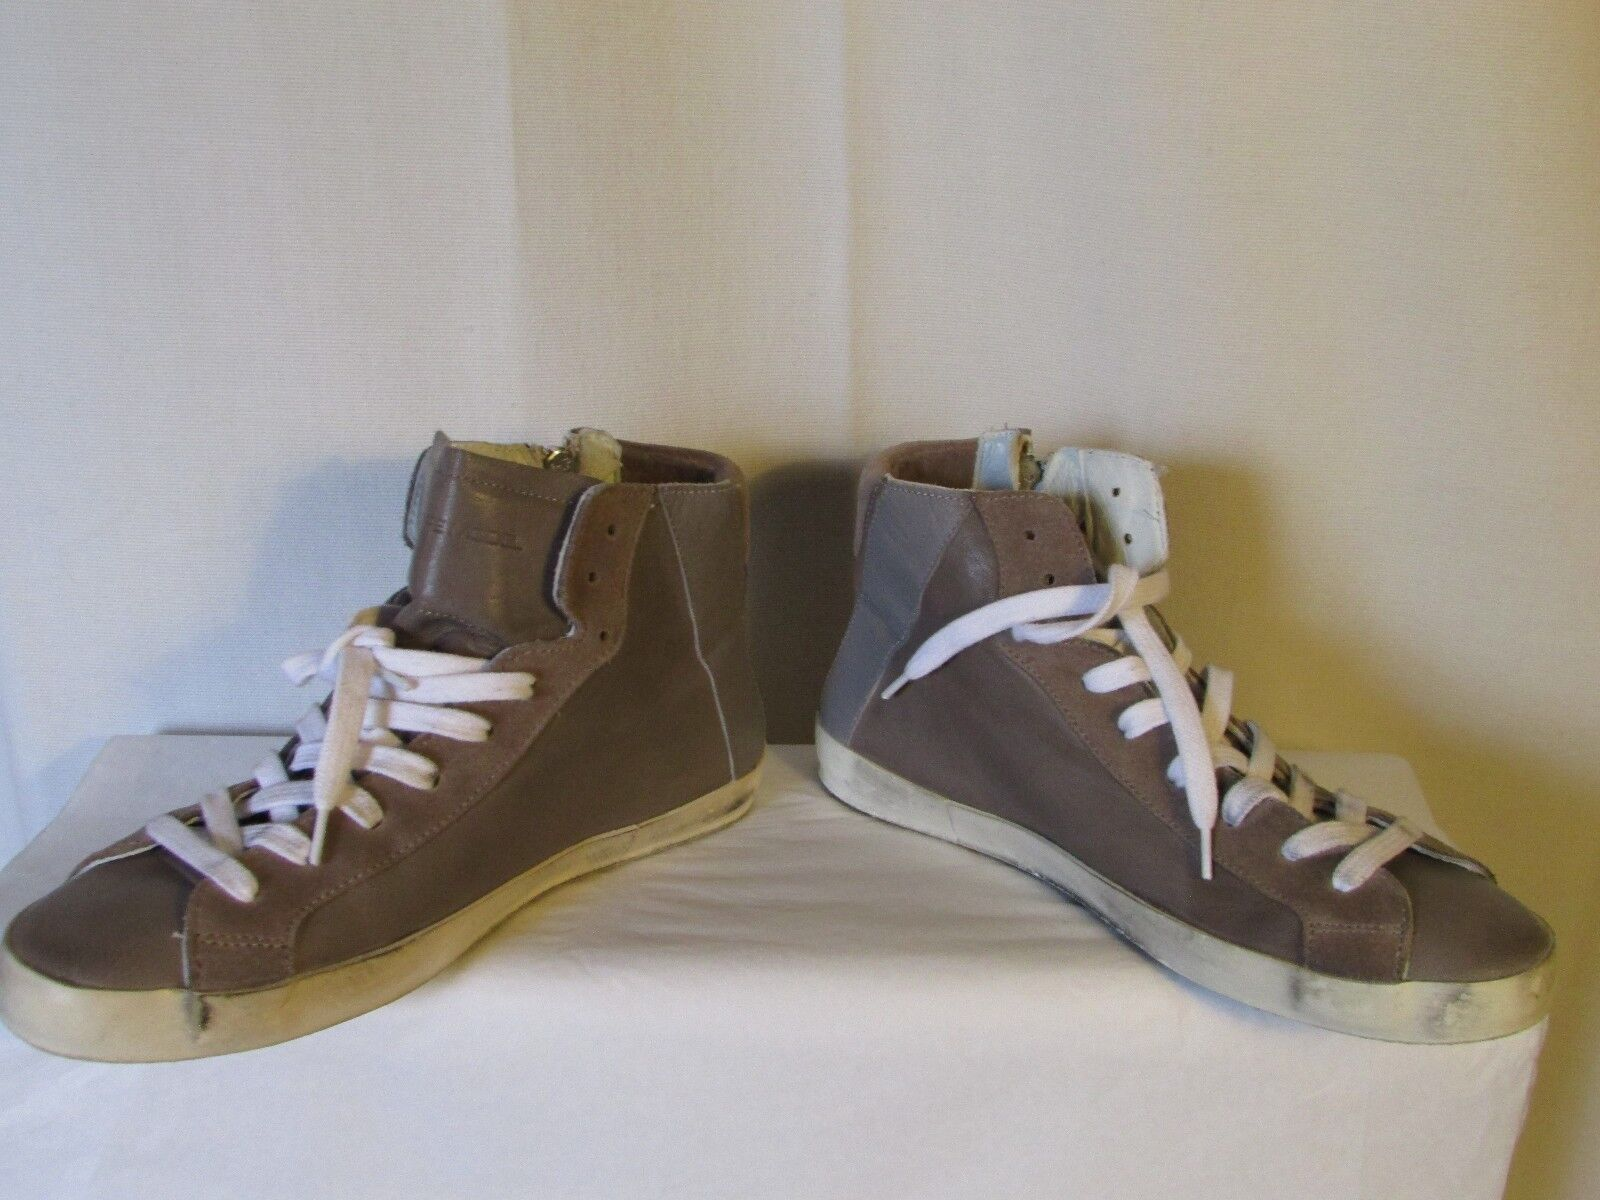 Schuhe/Turnschuhe und Philippe Modell Leder taupe und Schuhe/Turnschuhe Wildleder taupe 40 5a1c80